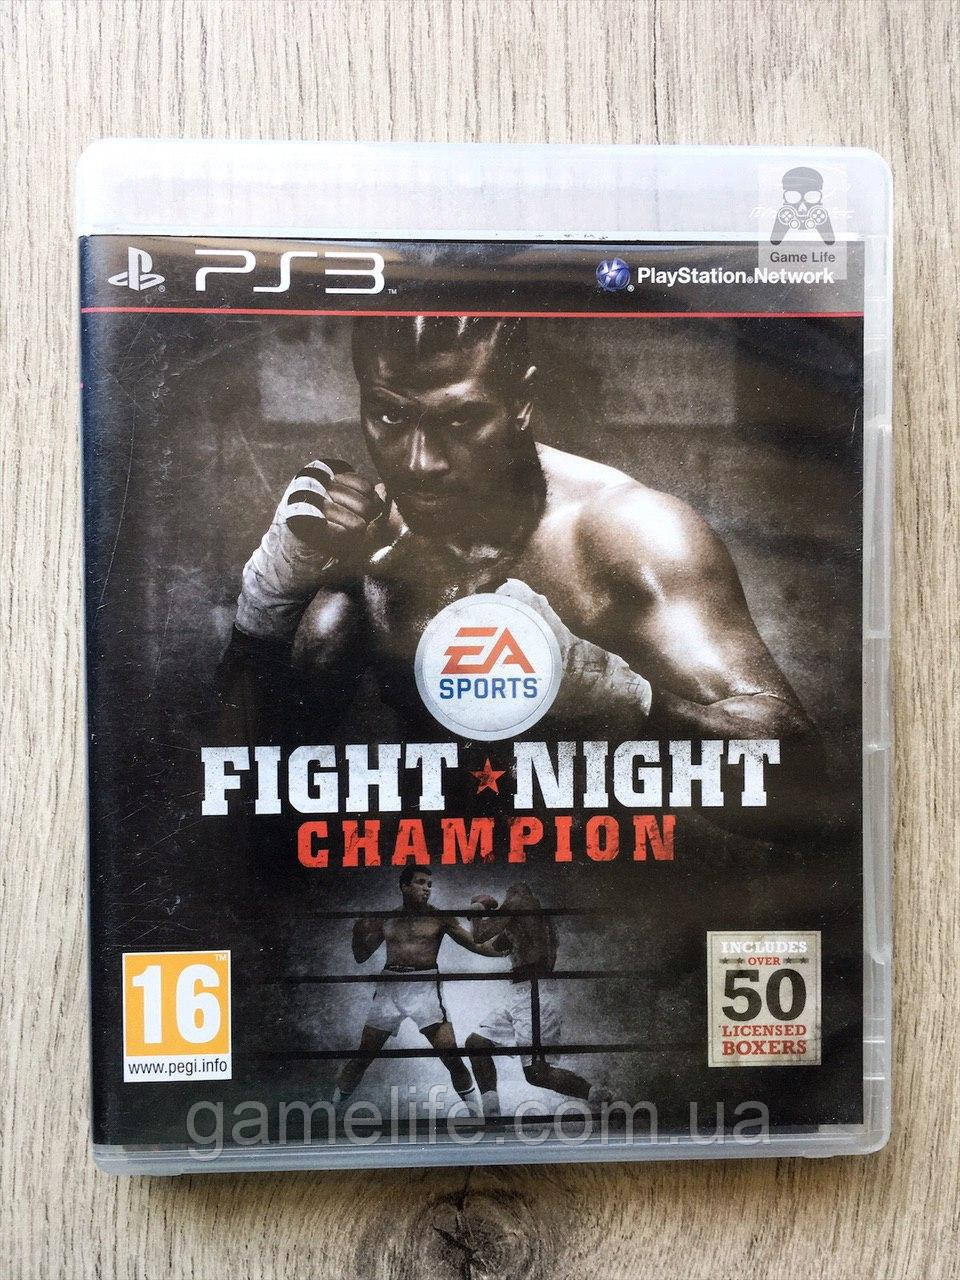 Fight Night Champion (англ.) (б/у) PS3